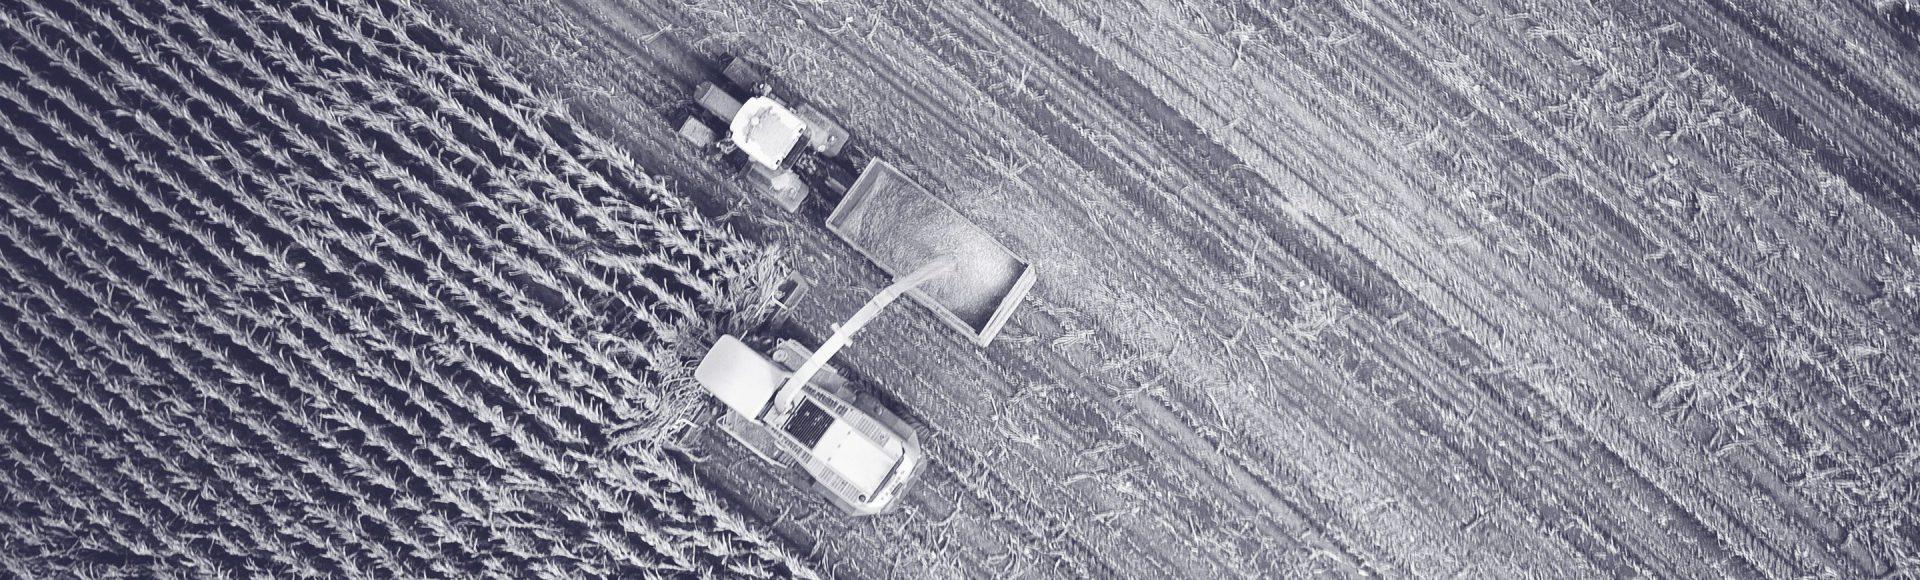 ARK-Invest_Blog-Banner_2014_12_15---Montana-Data-Agriculture